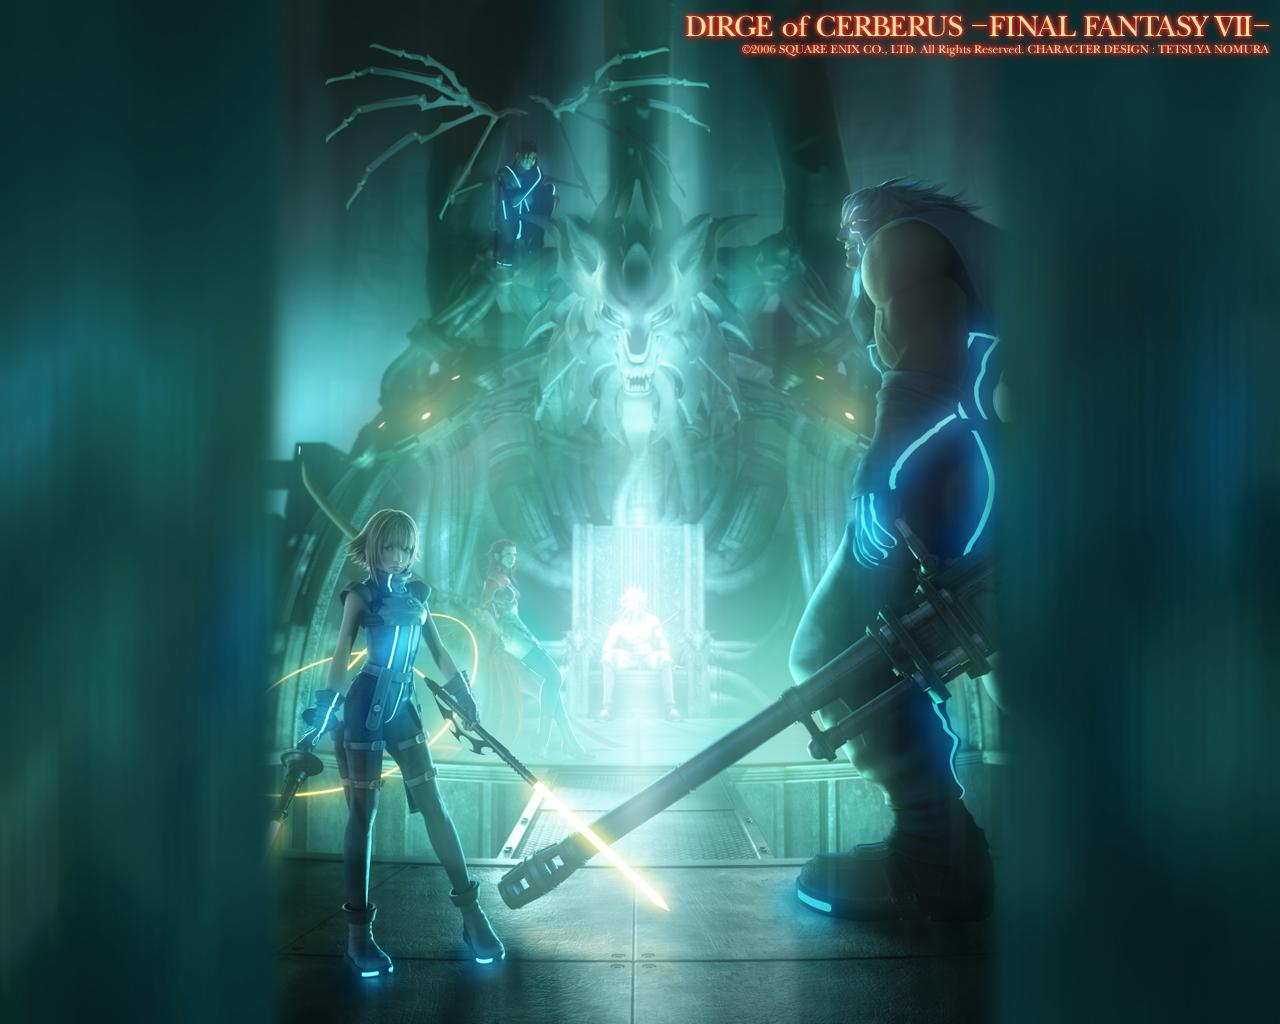 Final Fantasy VII Set 4   Final Fantasy Wallpaper 78723 1280x1024